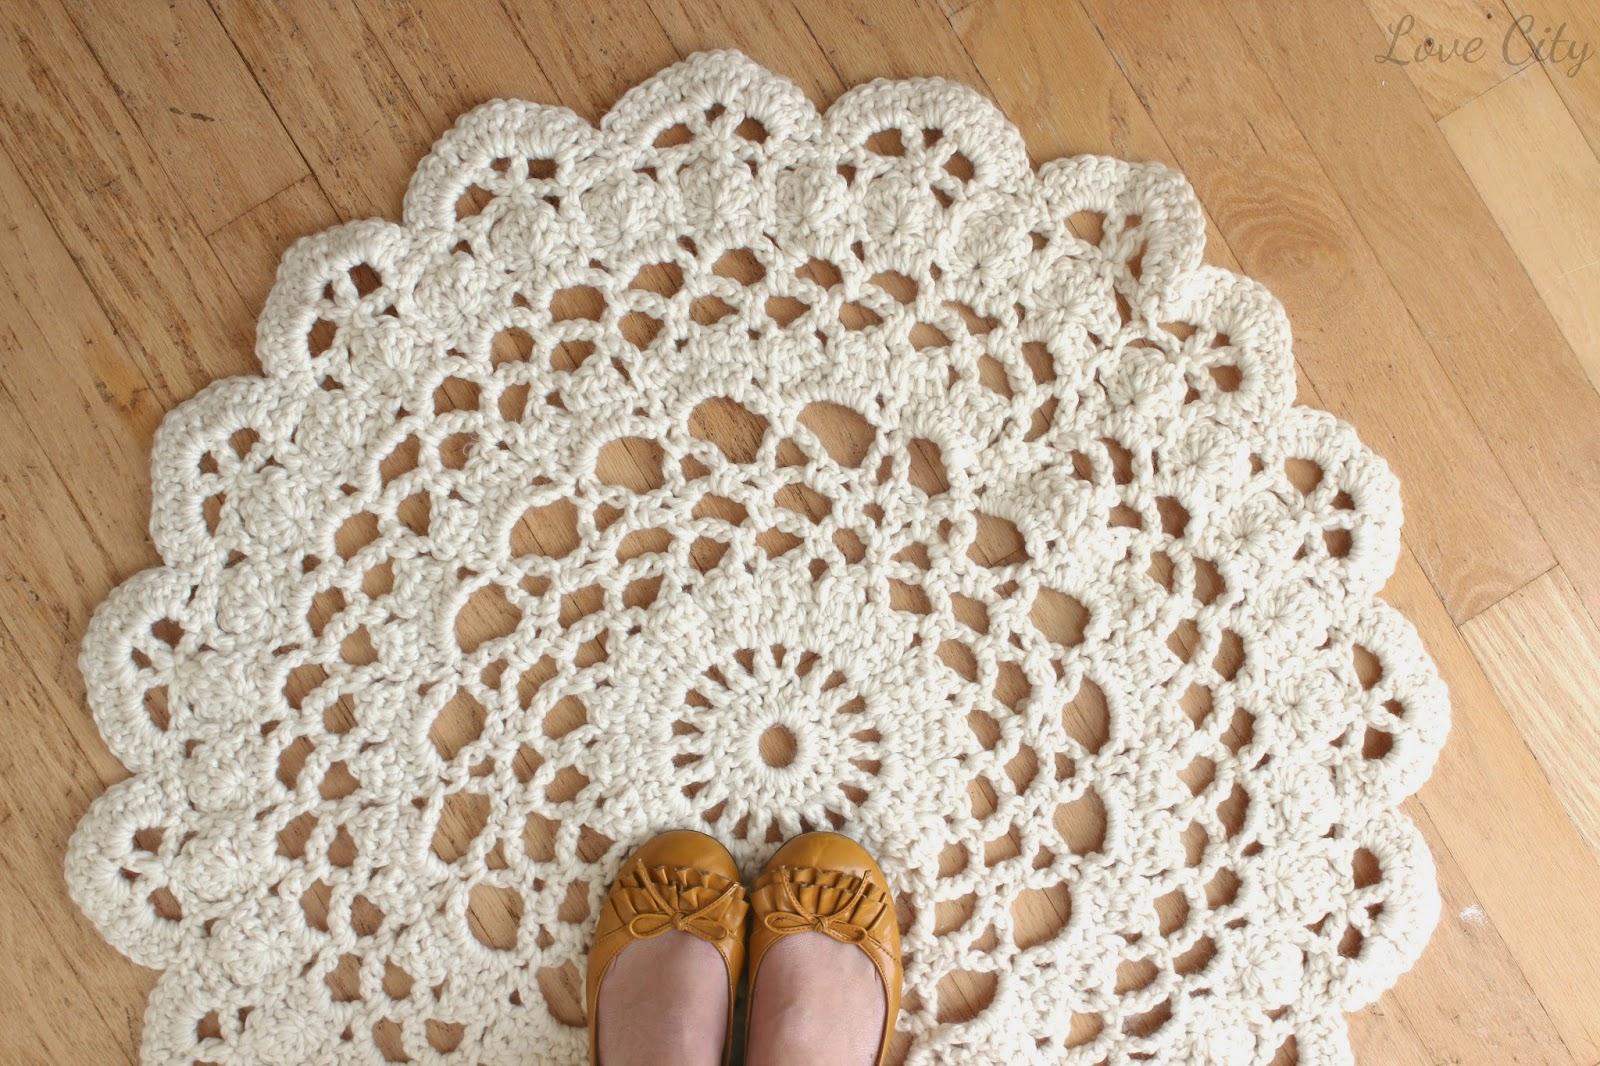 Love City Crochet Doily Rug